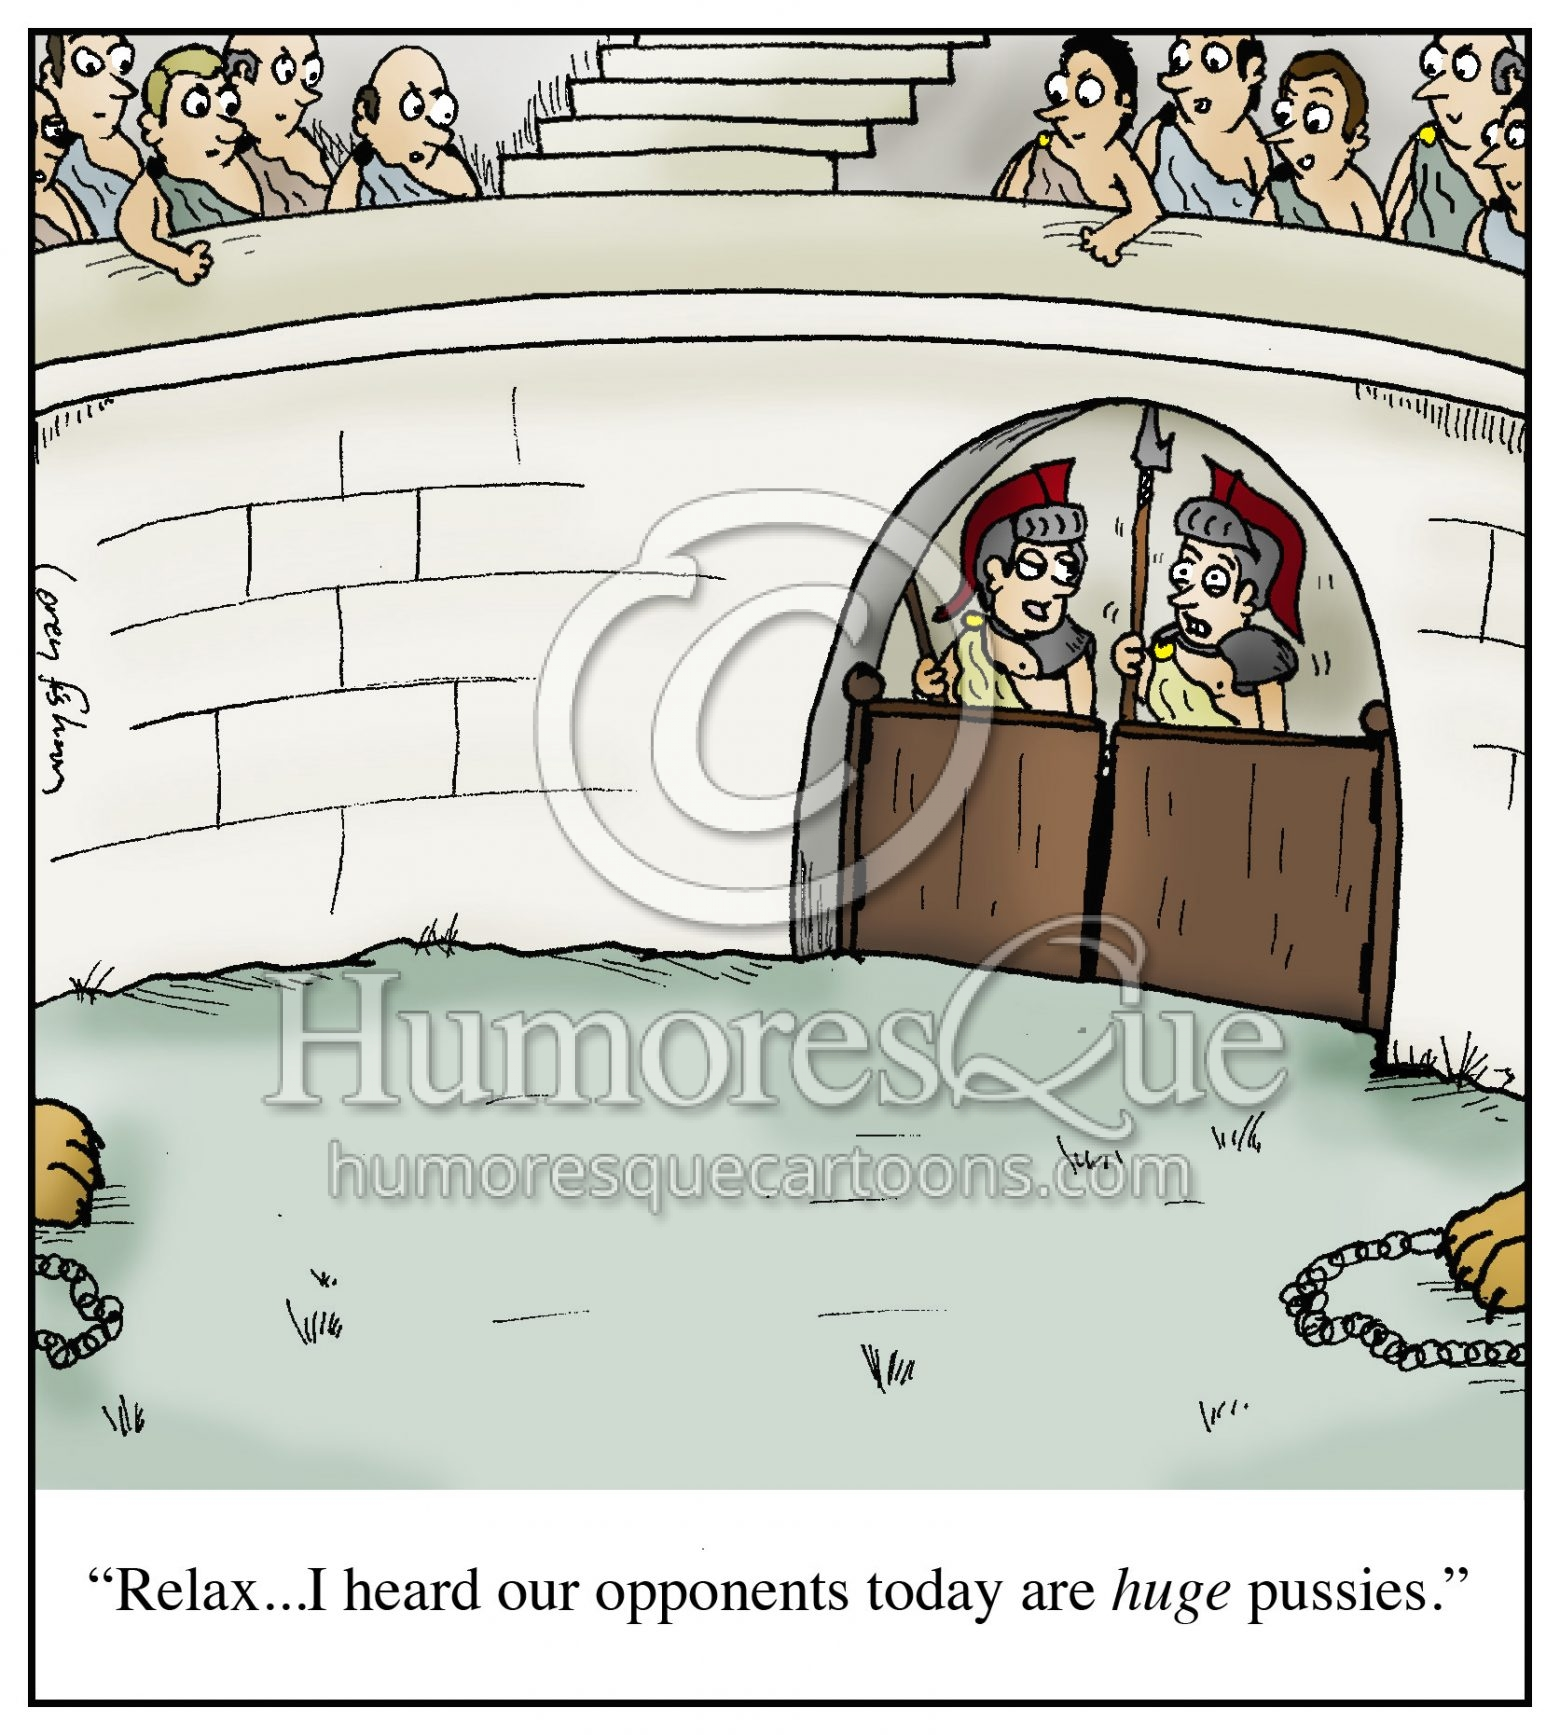 huge pussies ancient rome gladiator cartoon